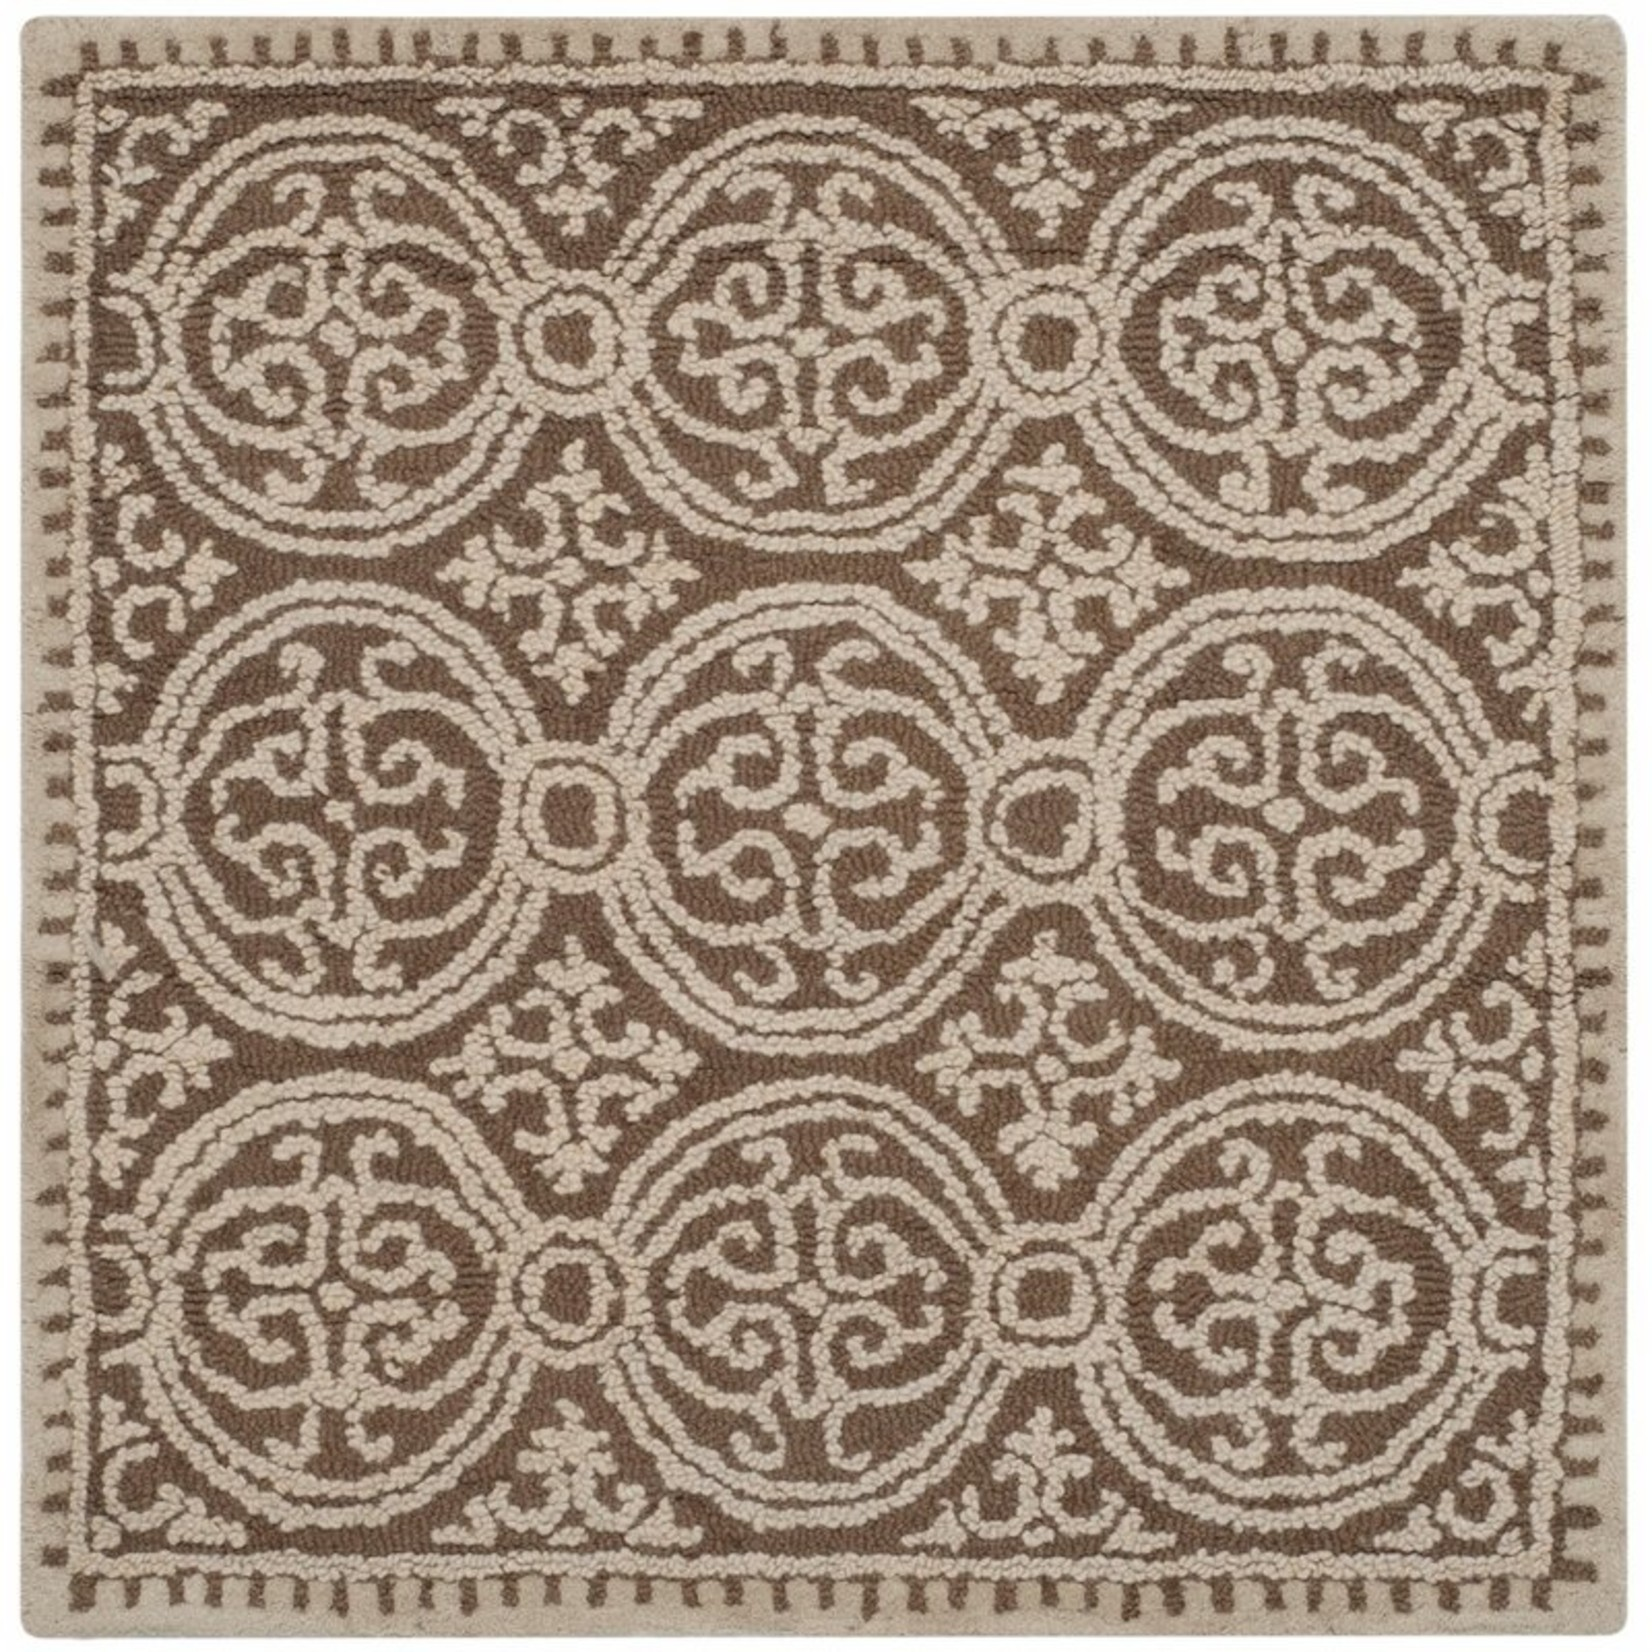 "* 10"" Square - Fairburn Handmade Tufted Wool Tan Rug"